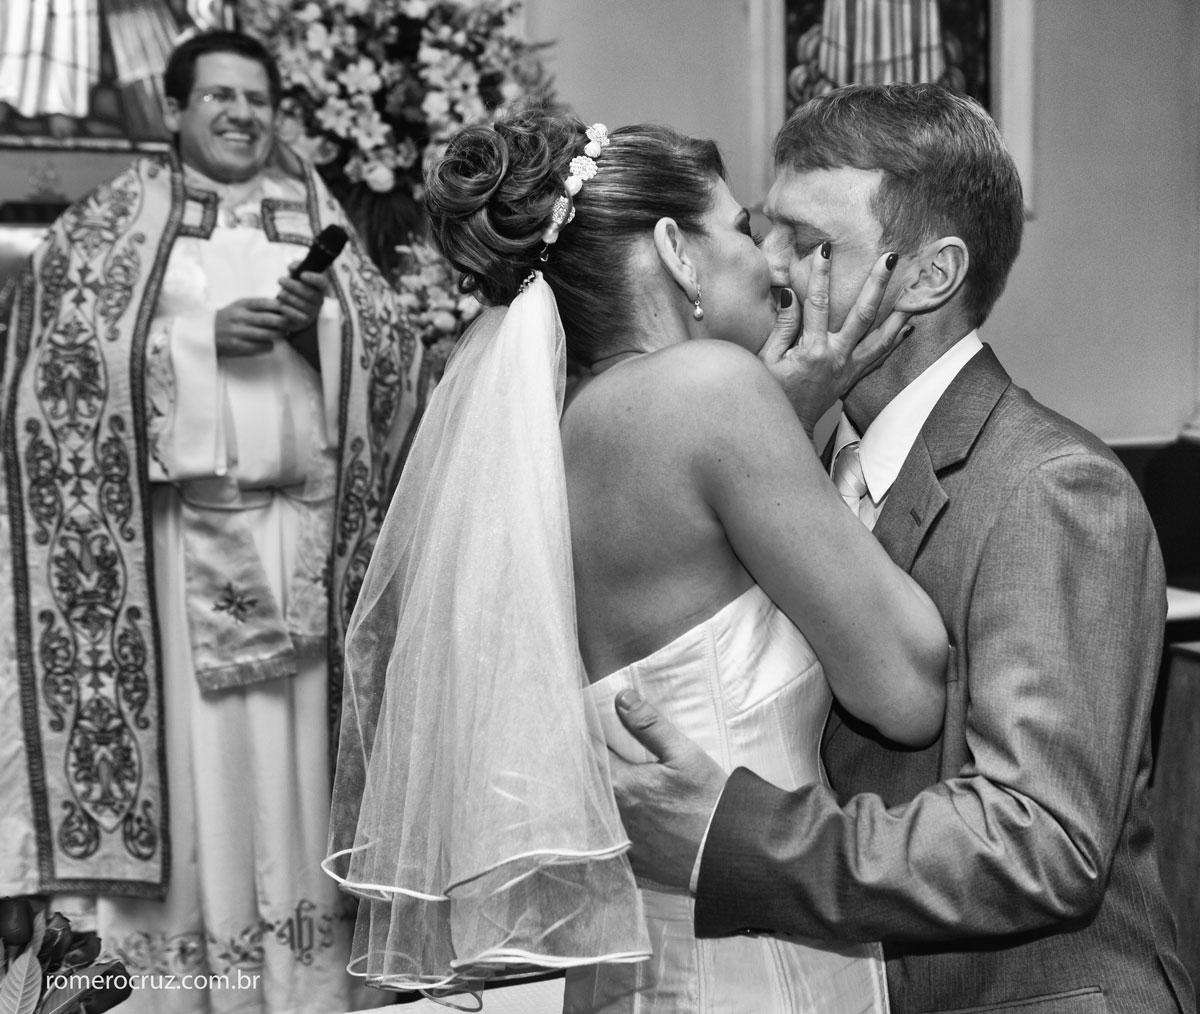 Fotografia emocionante do beijo dos noivos no casamento de Monica e Carlos